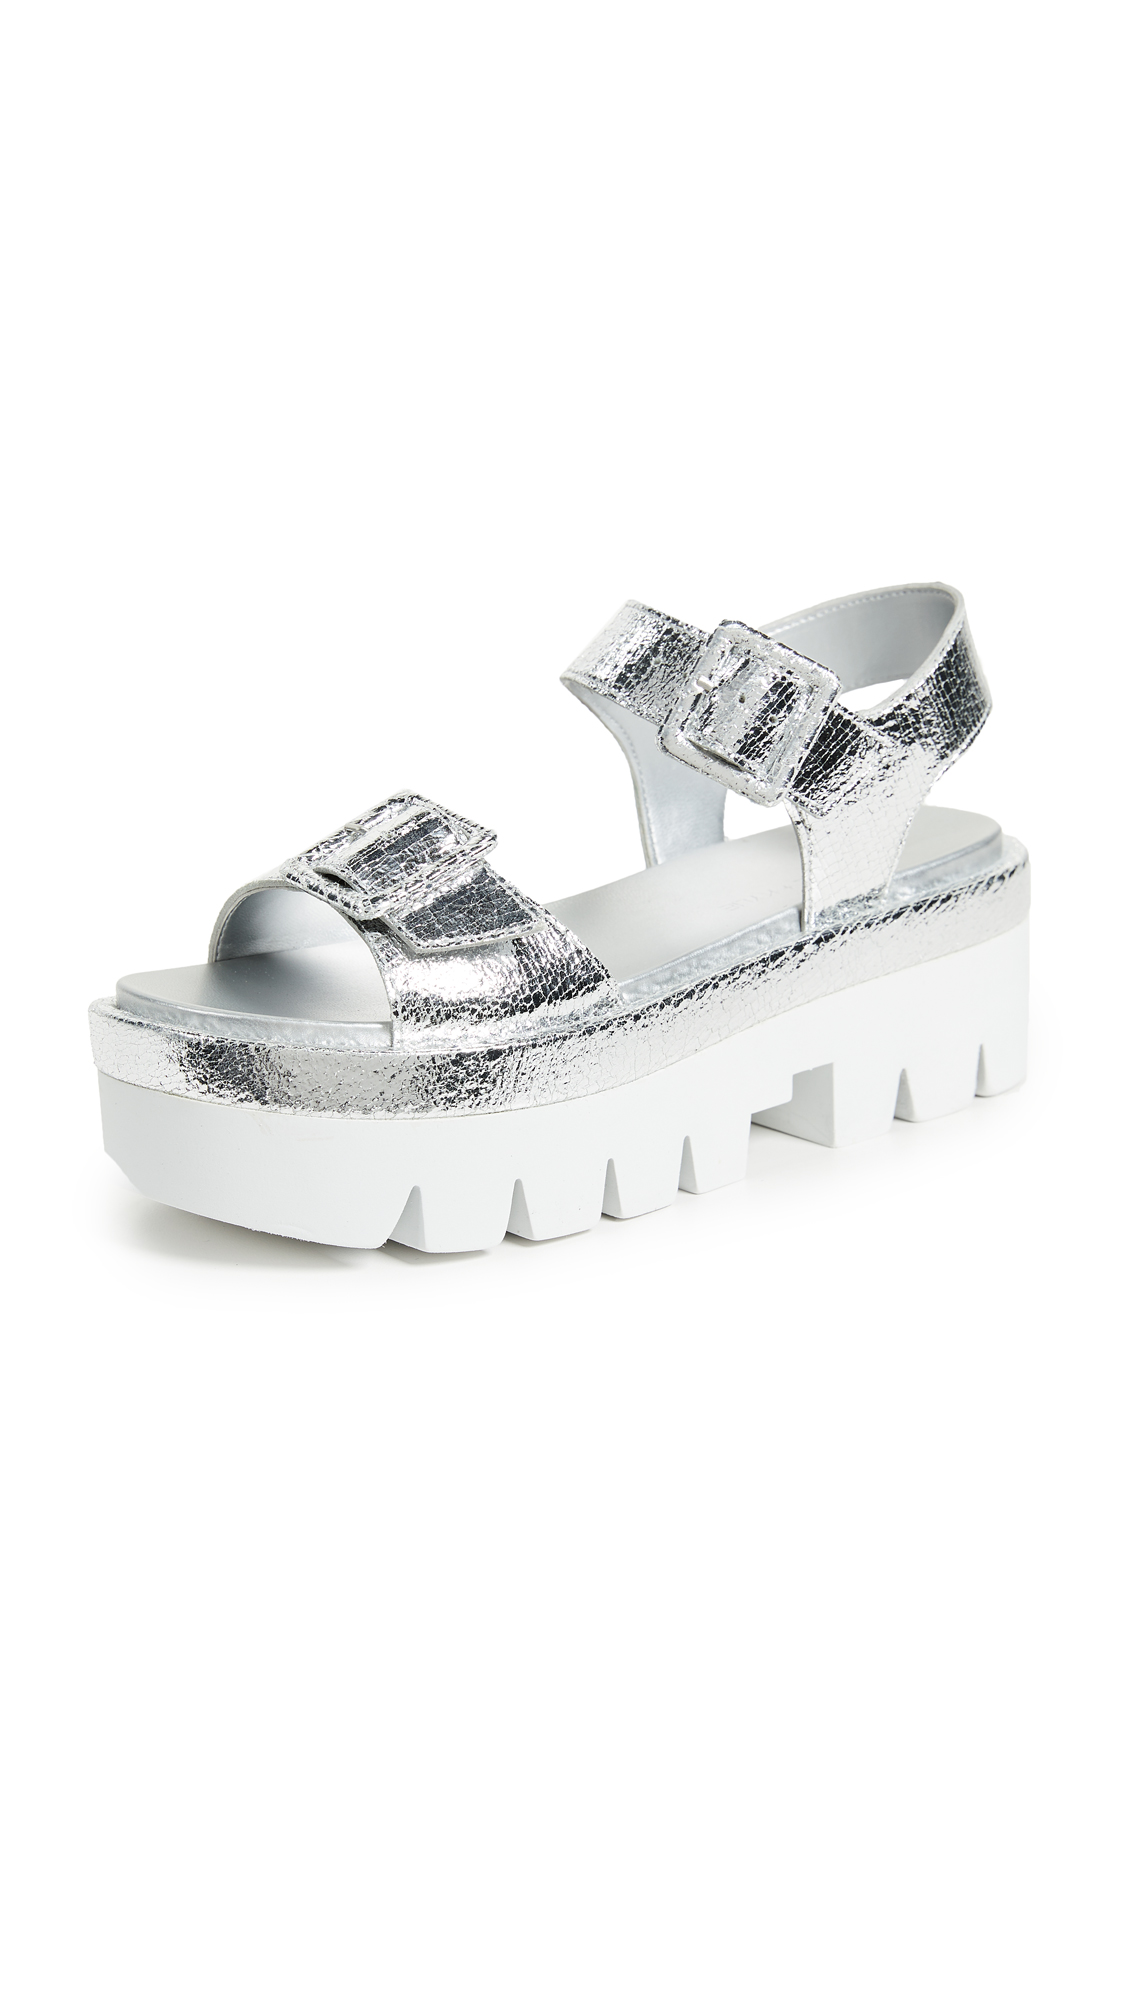 KENDALL + KYLIE Wave Platform Sandals - Silver